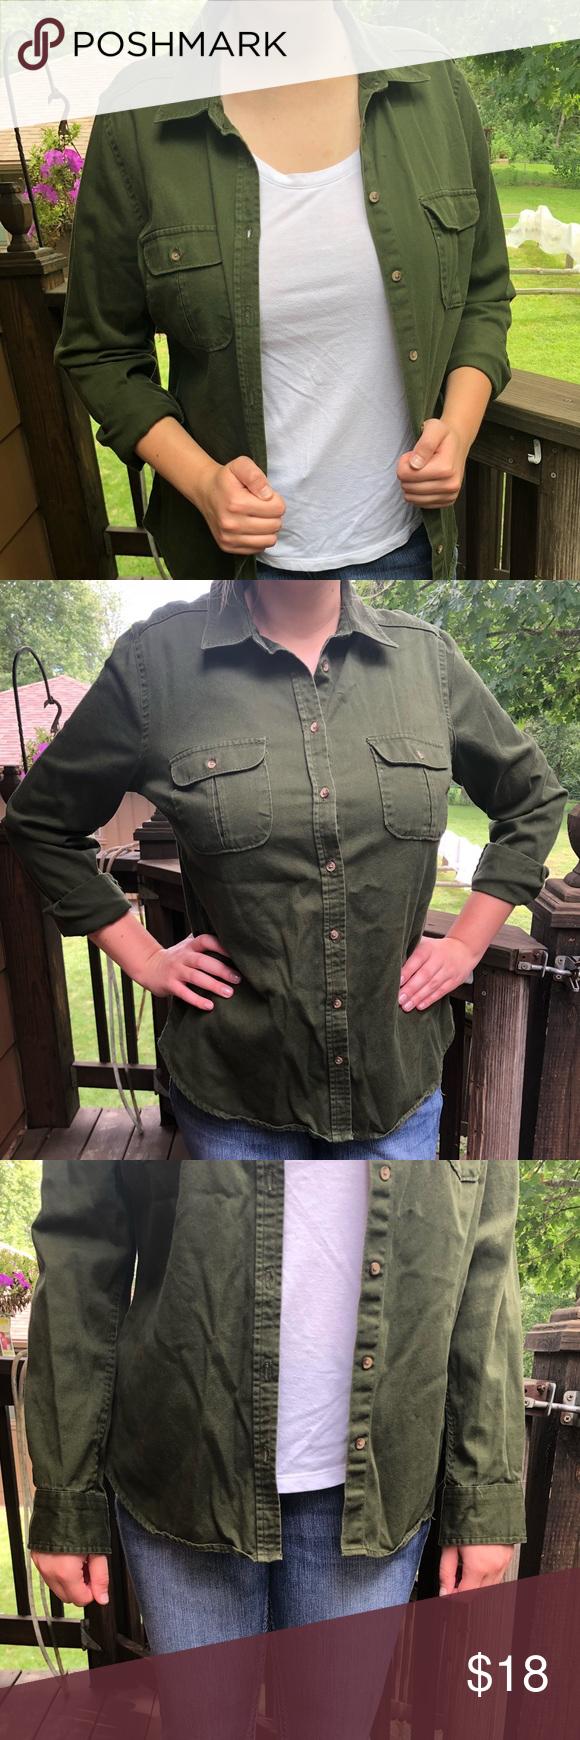 Dark green dress shirt  Dark Green Long Sleeve Shirt  My Posh Picks  Pinterest  Fashion